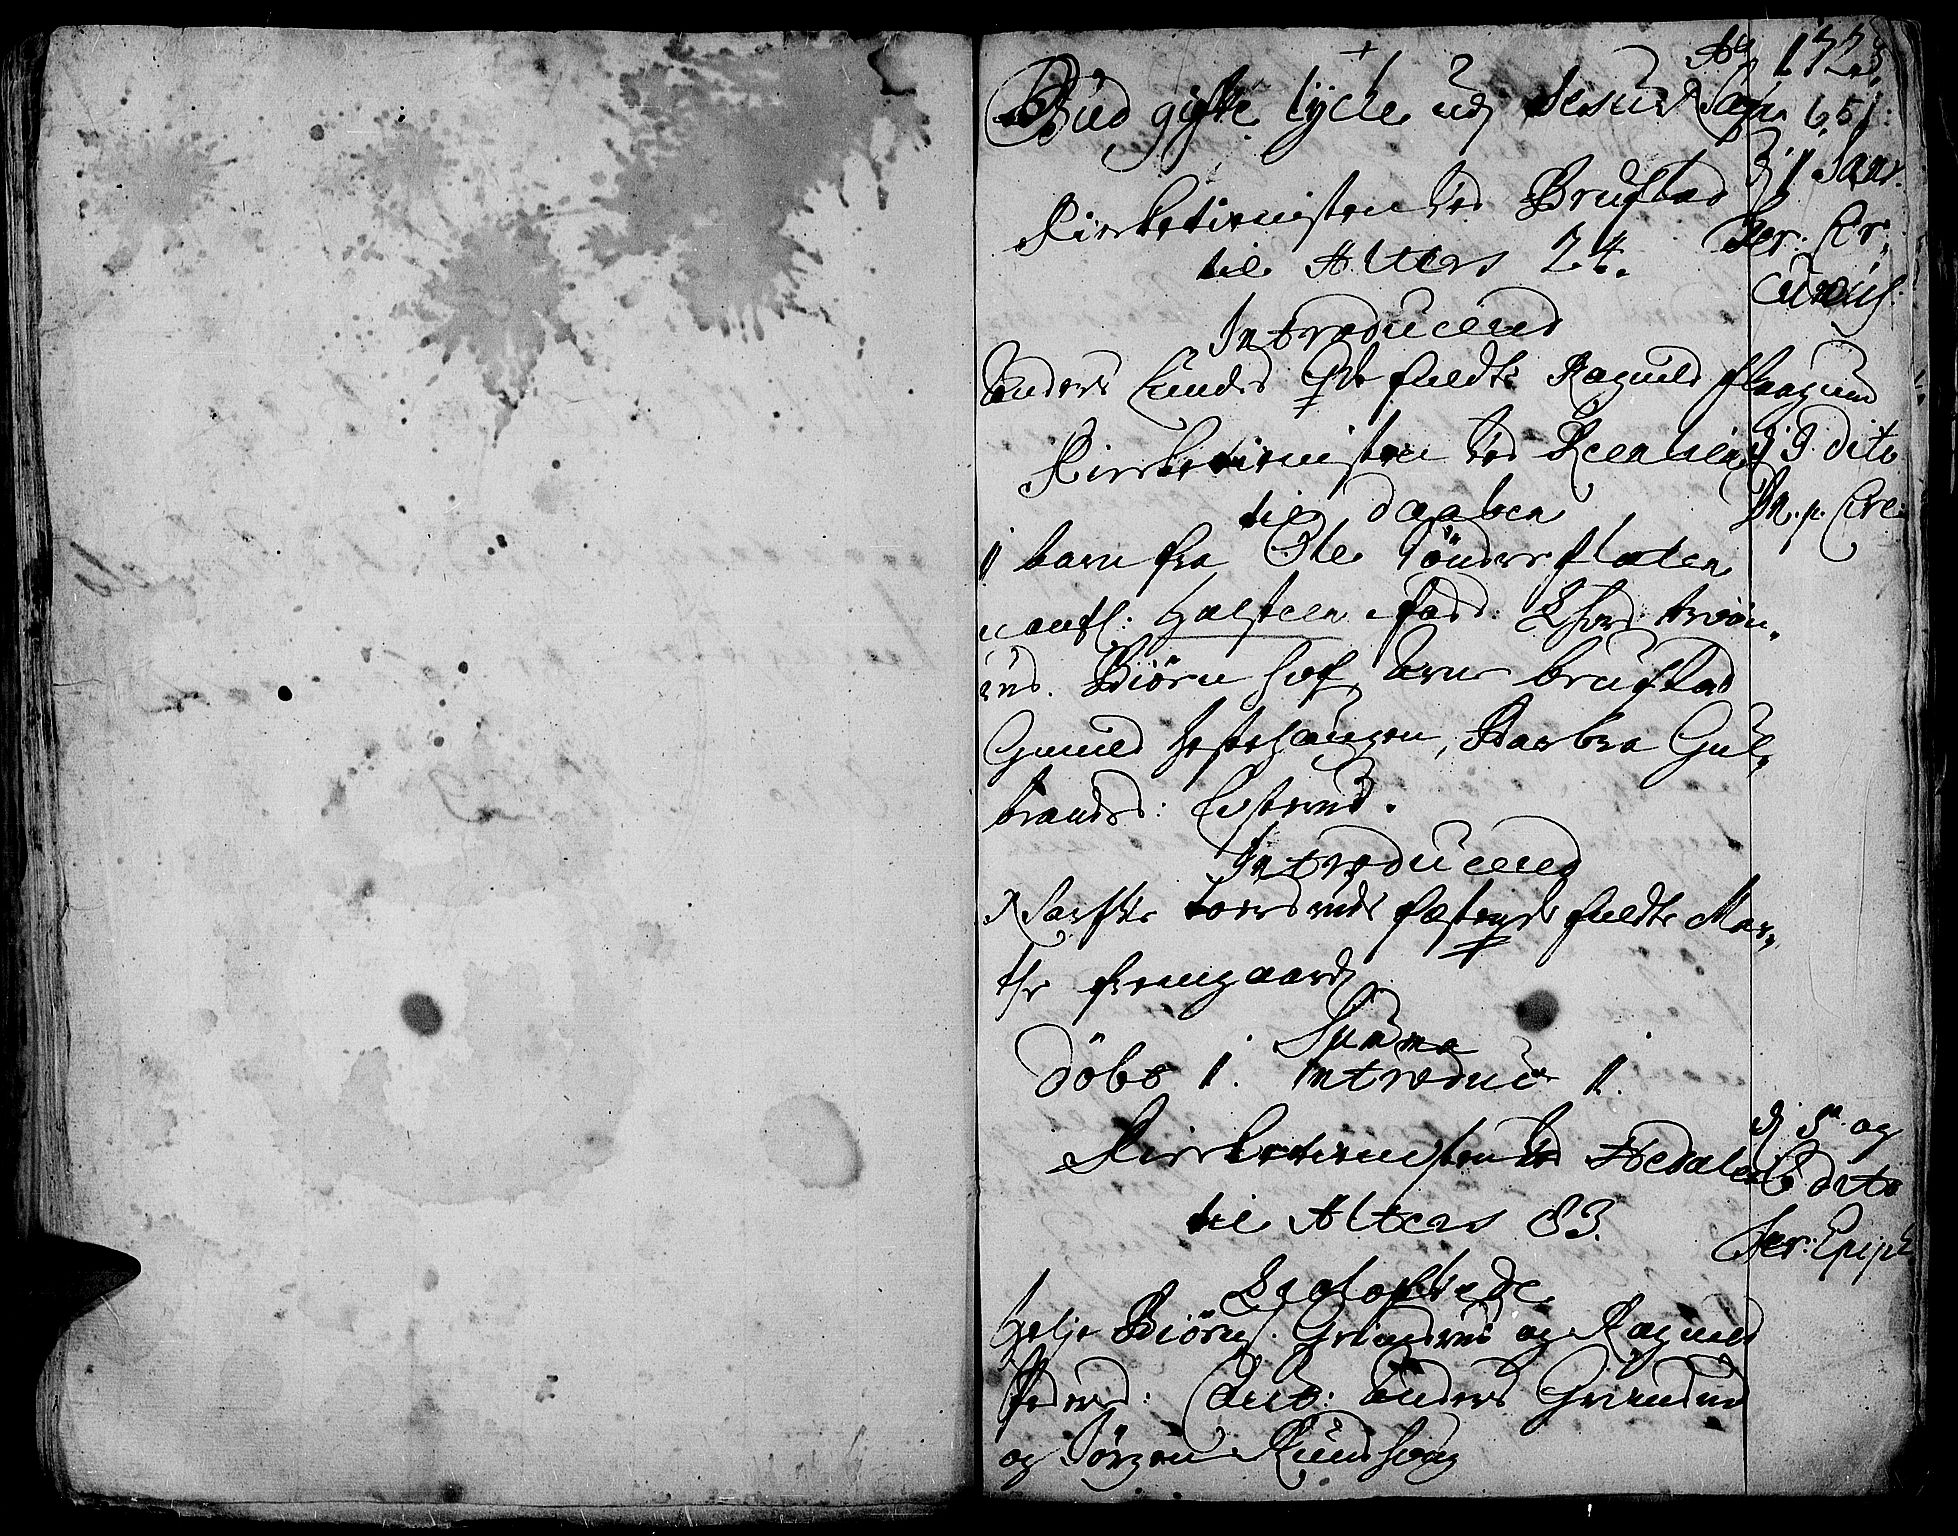 SAH, Aurdal prestekontor, Ministerialbok nr. 1-3, 1692-1730, s. 651